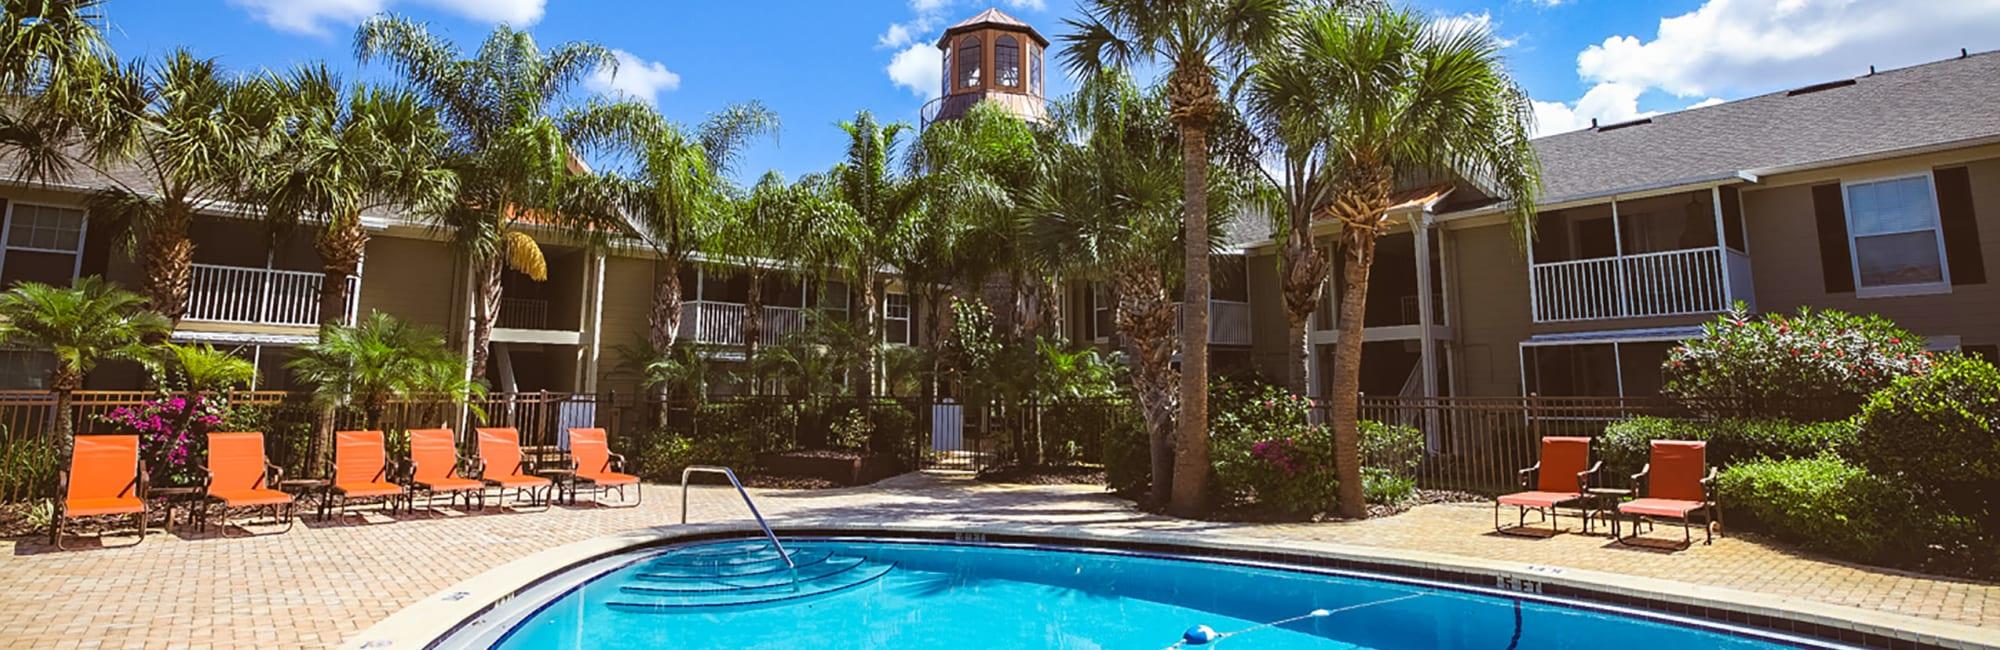 Winter Park, Florida, apartments at Signal Pointe Apartment Homes